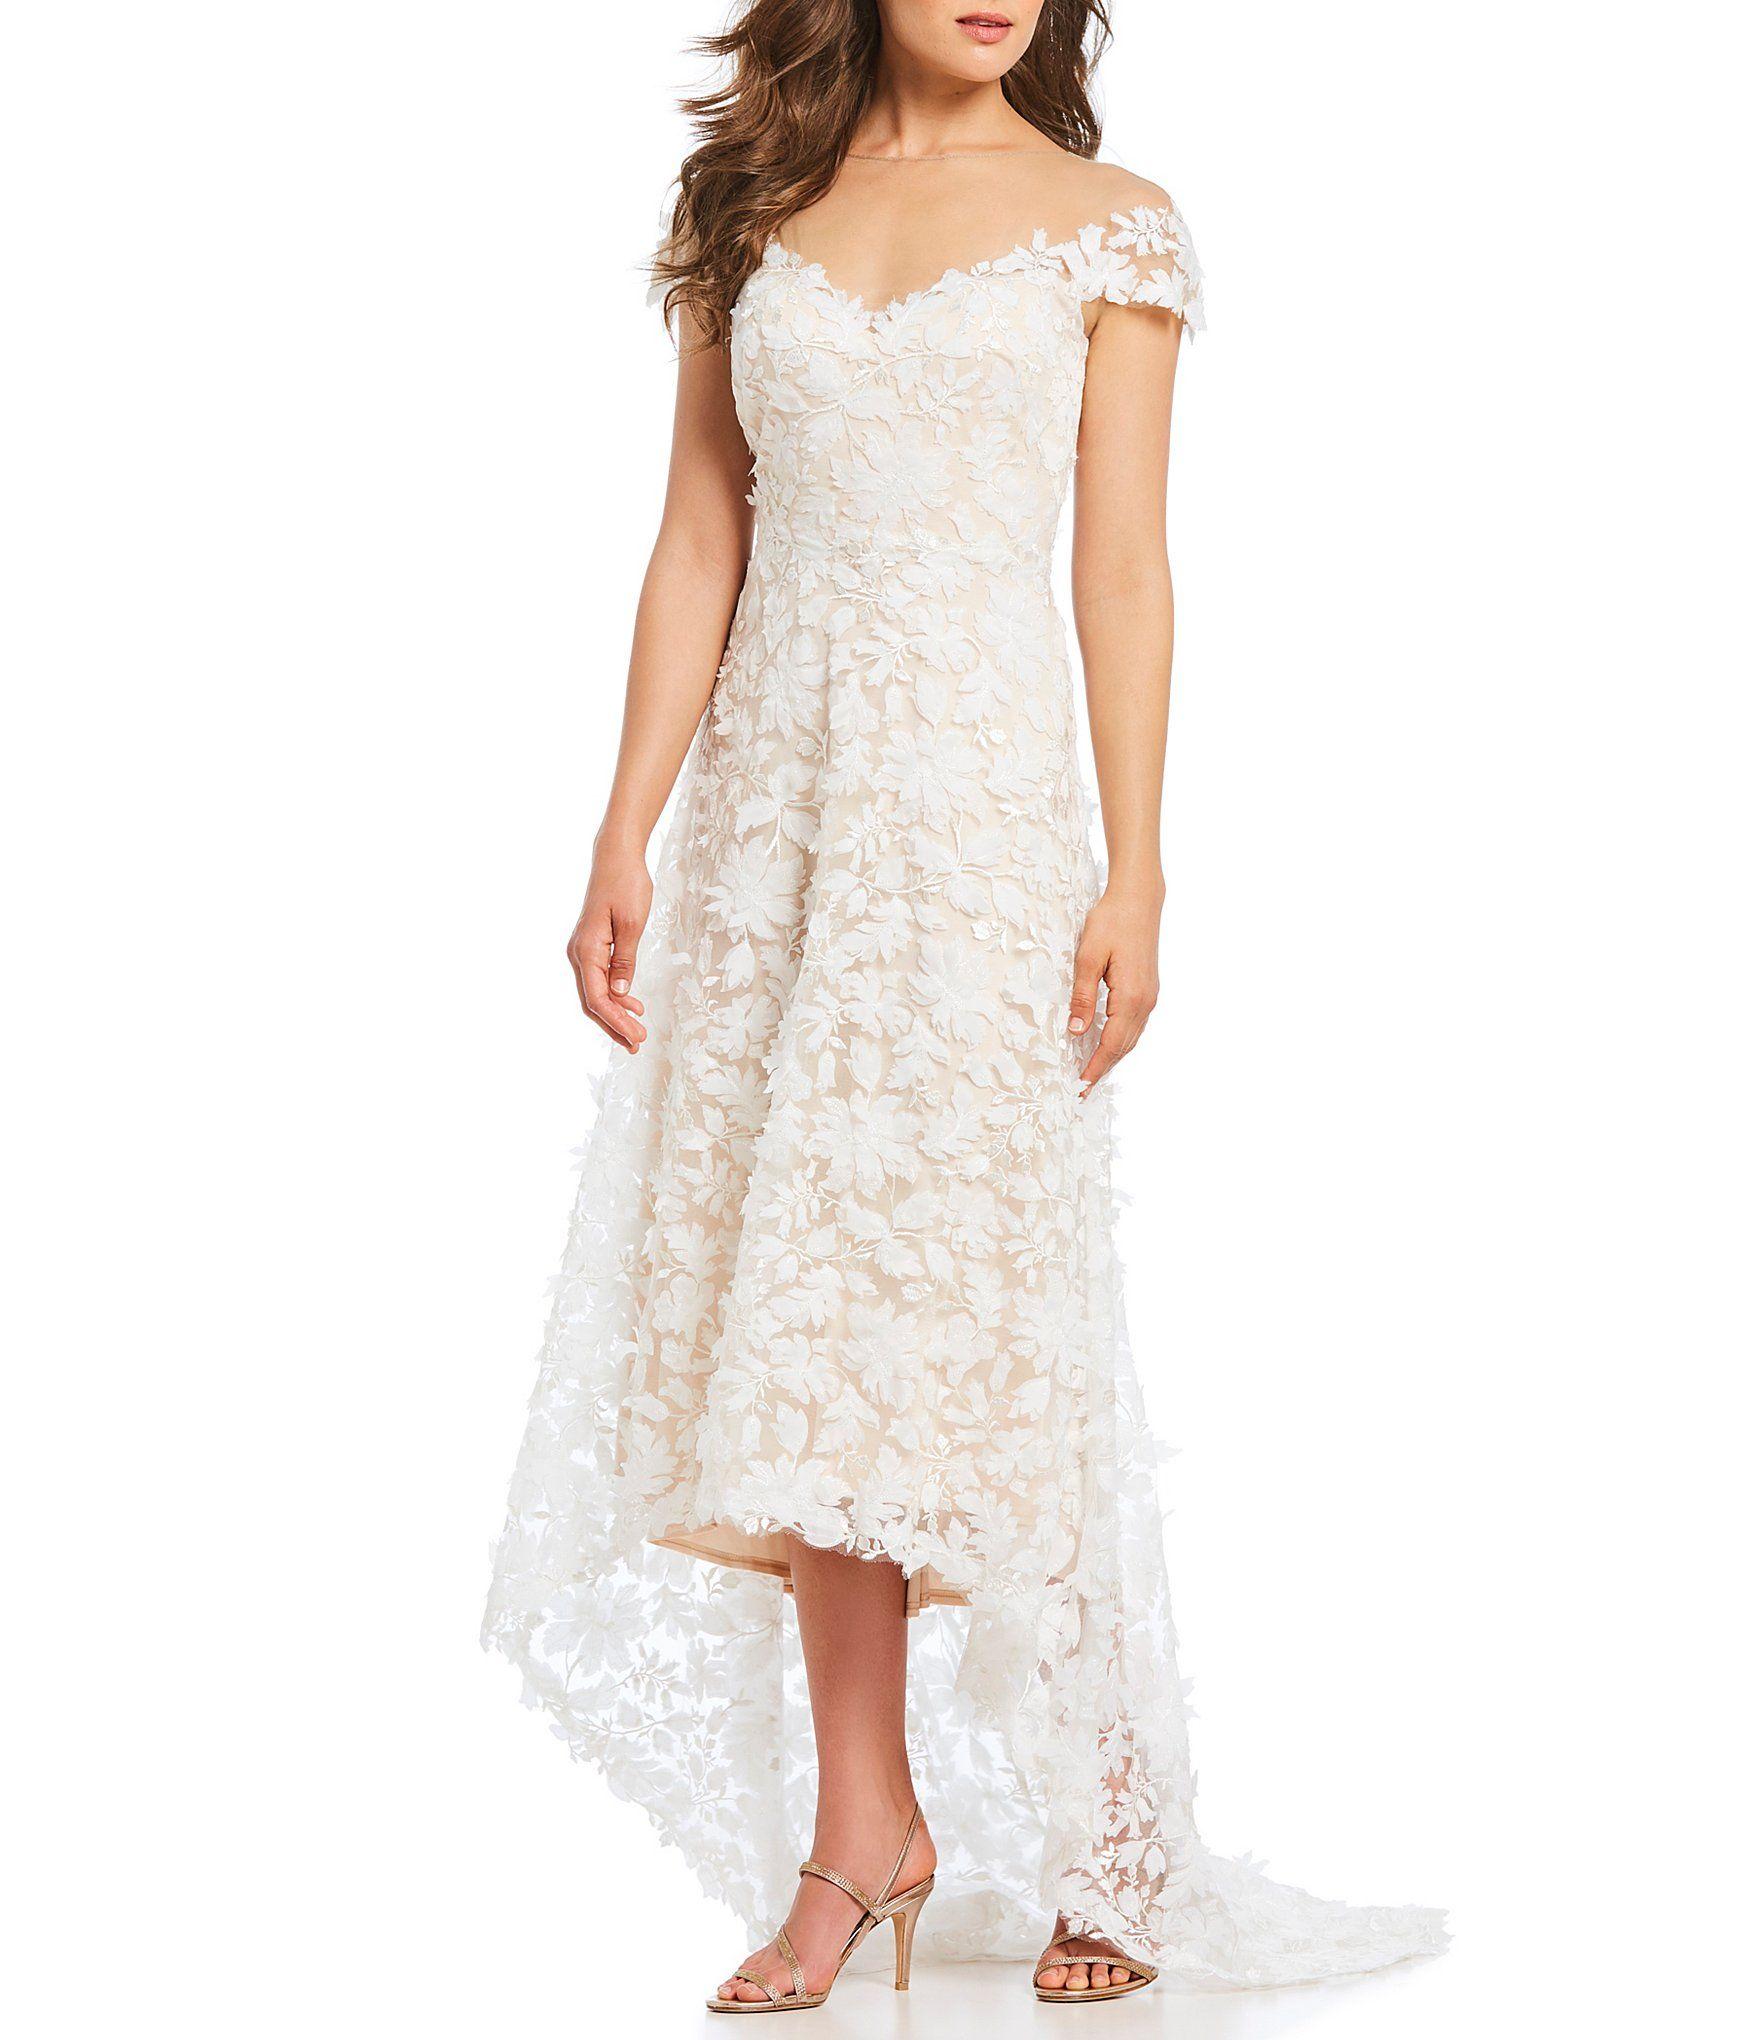 Tadashi Shoji Illusion Yoke Hi Lo Gown Dillards Dresses Wedding Dress Suit Hi Low Dresses